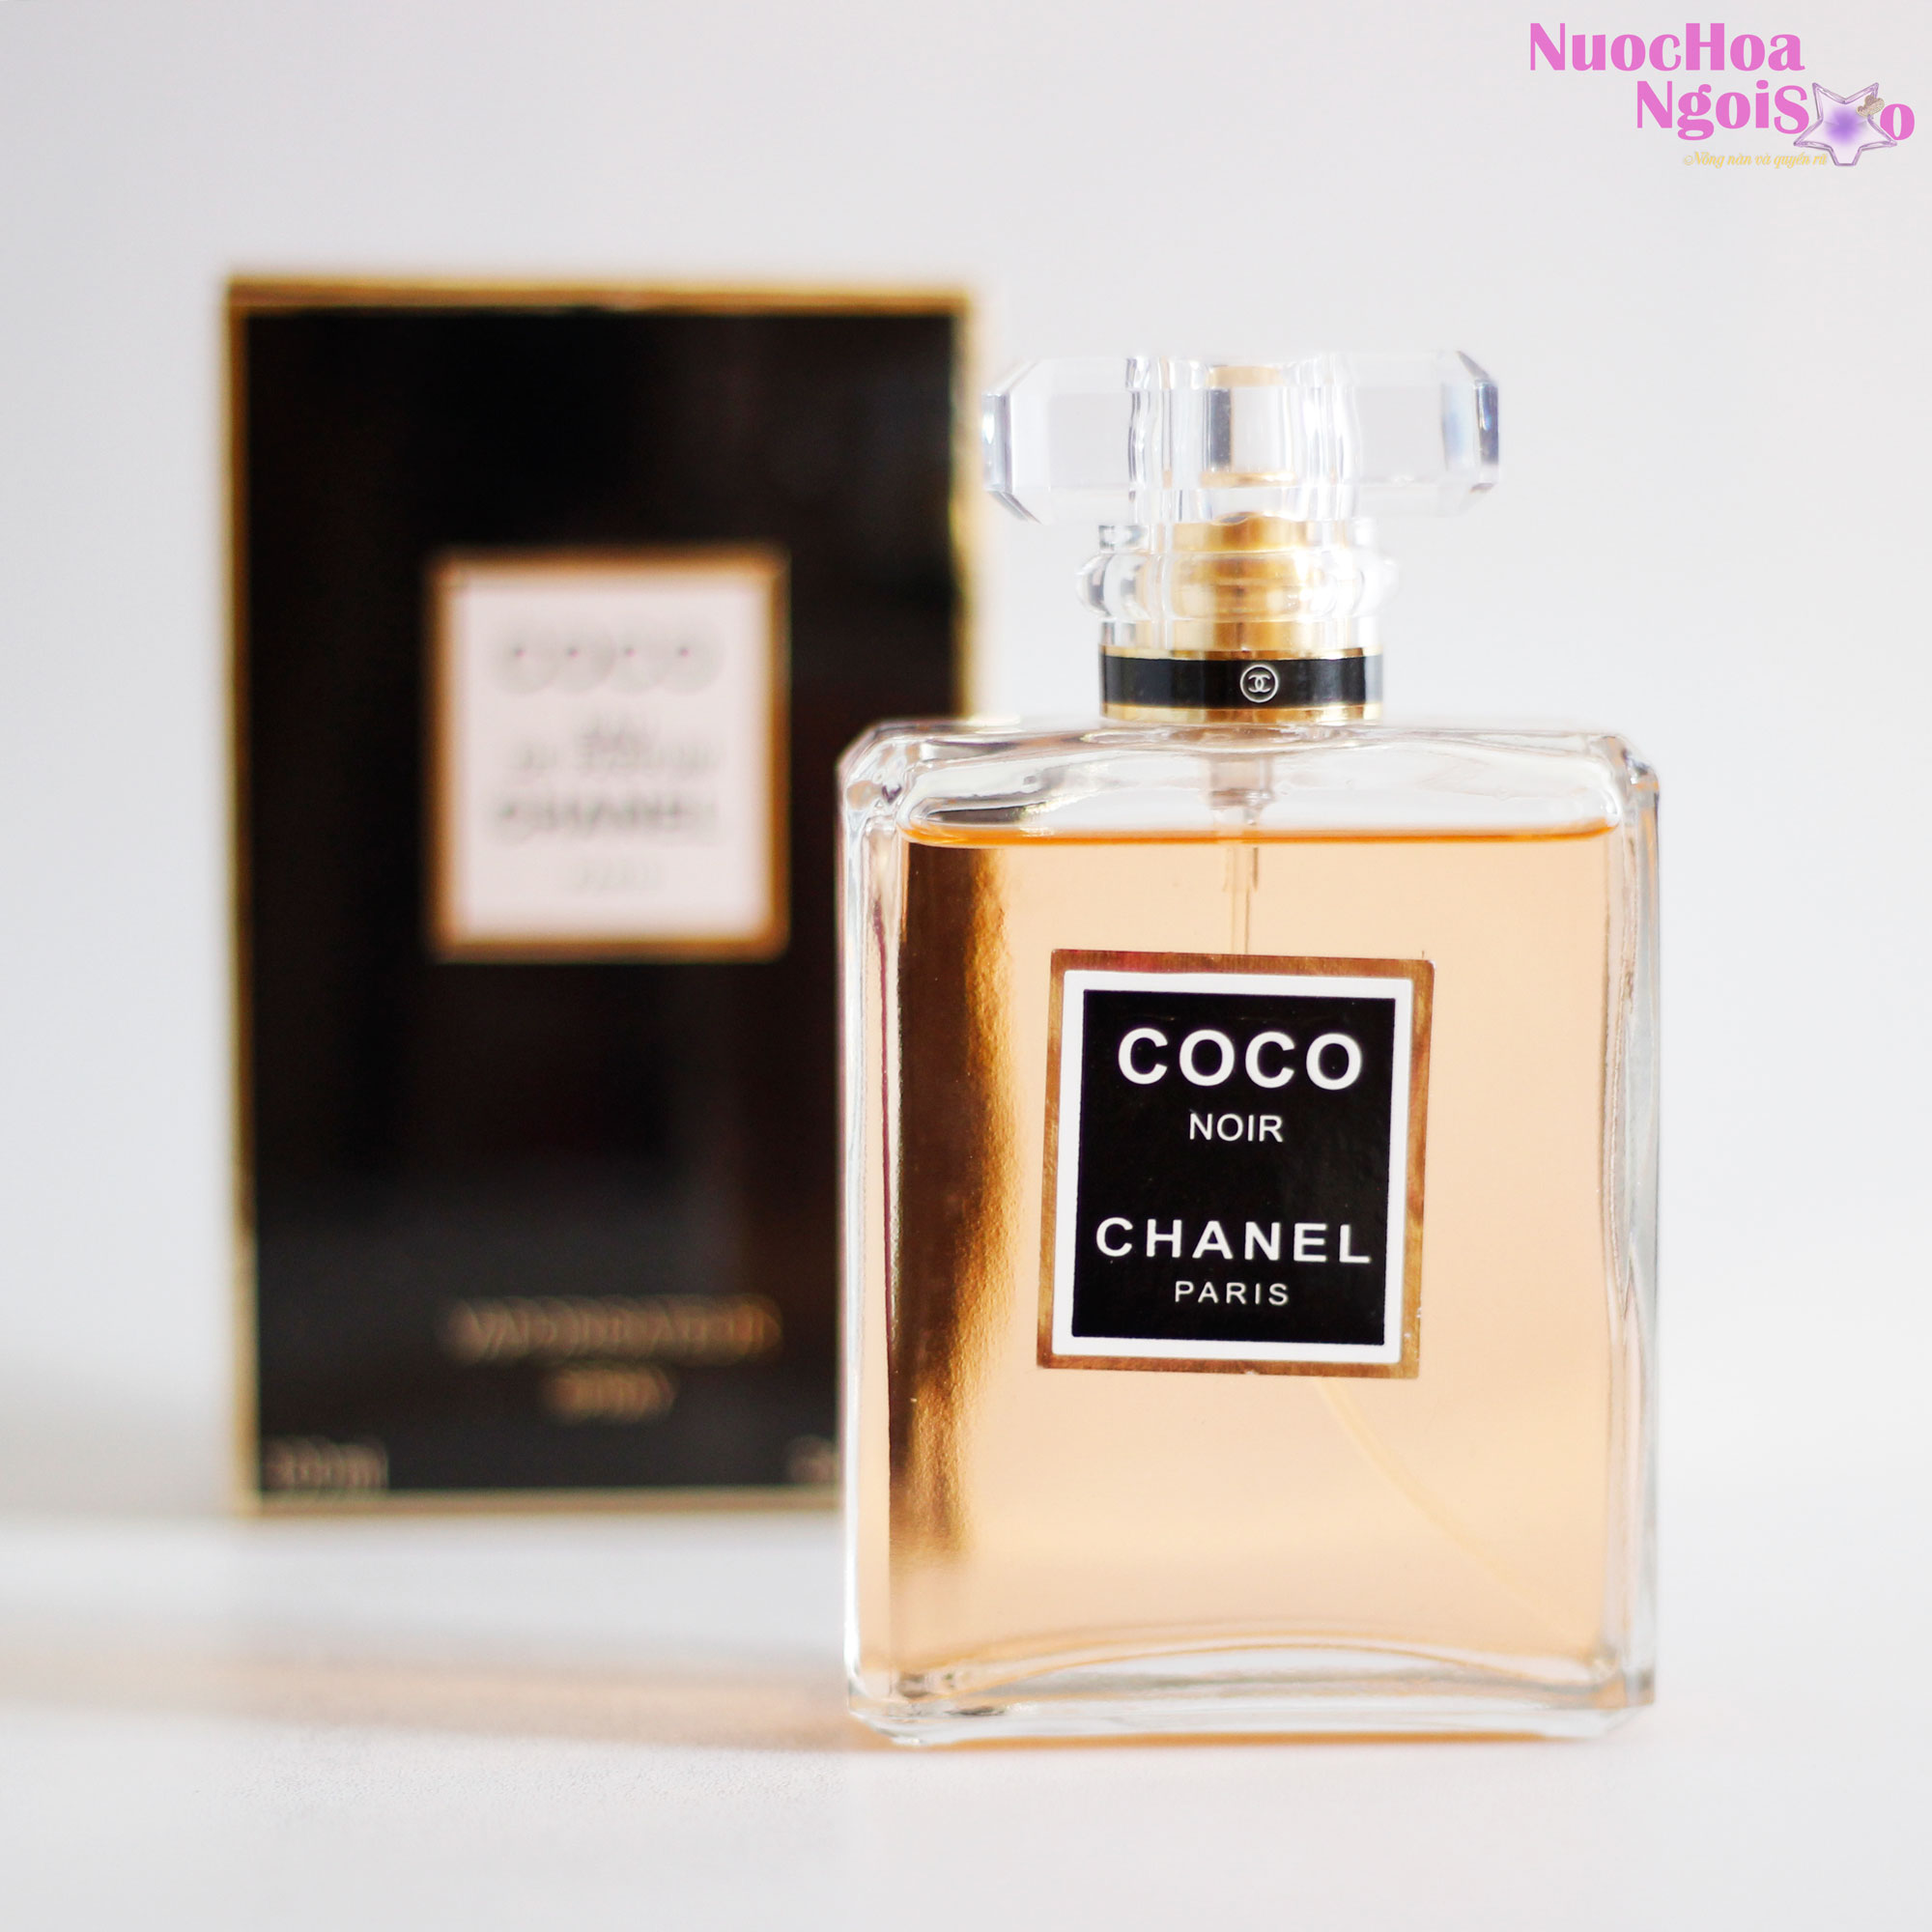 Nước hoa nữ Coco Eau de Parfum của hãng CHANEL